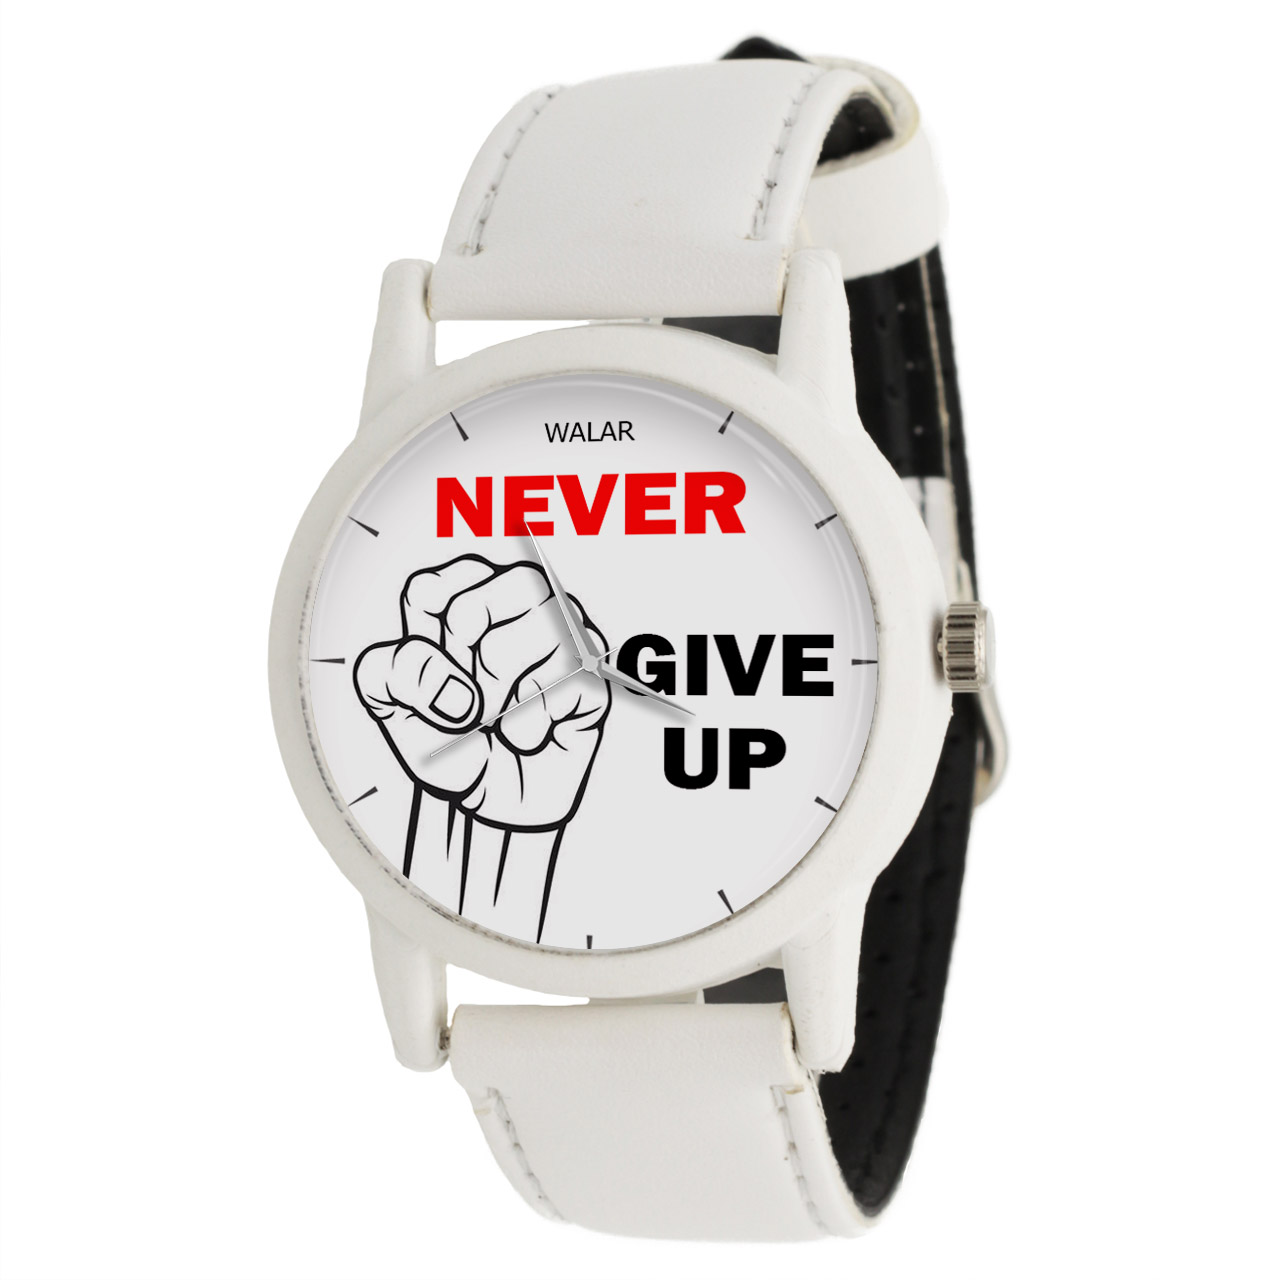 ساعت مچی عقربه ای والار طرح Never Give Up کد LF1589